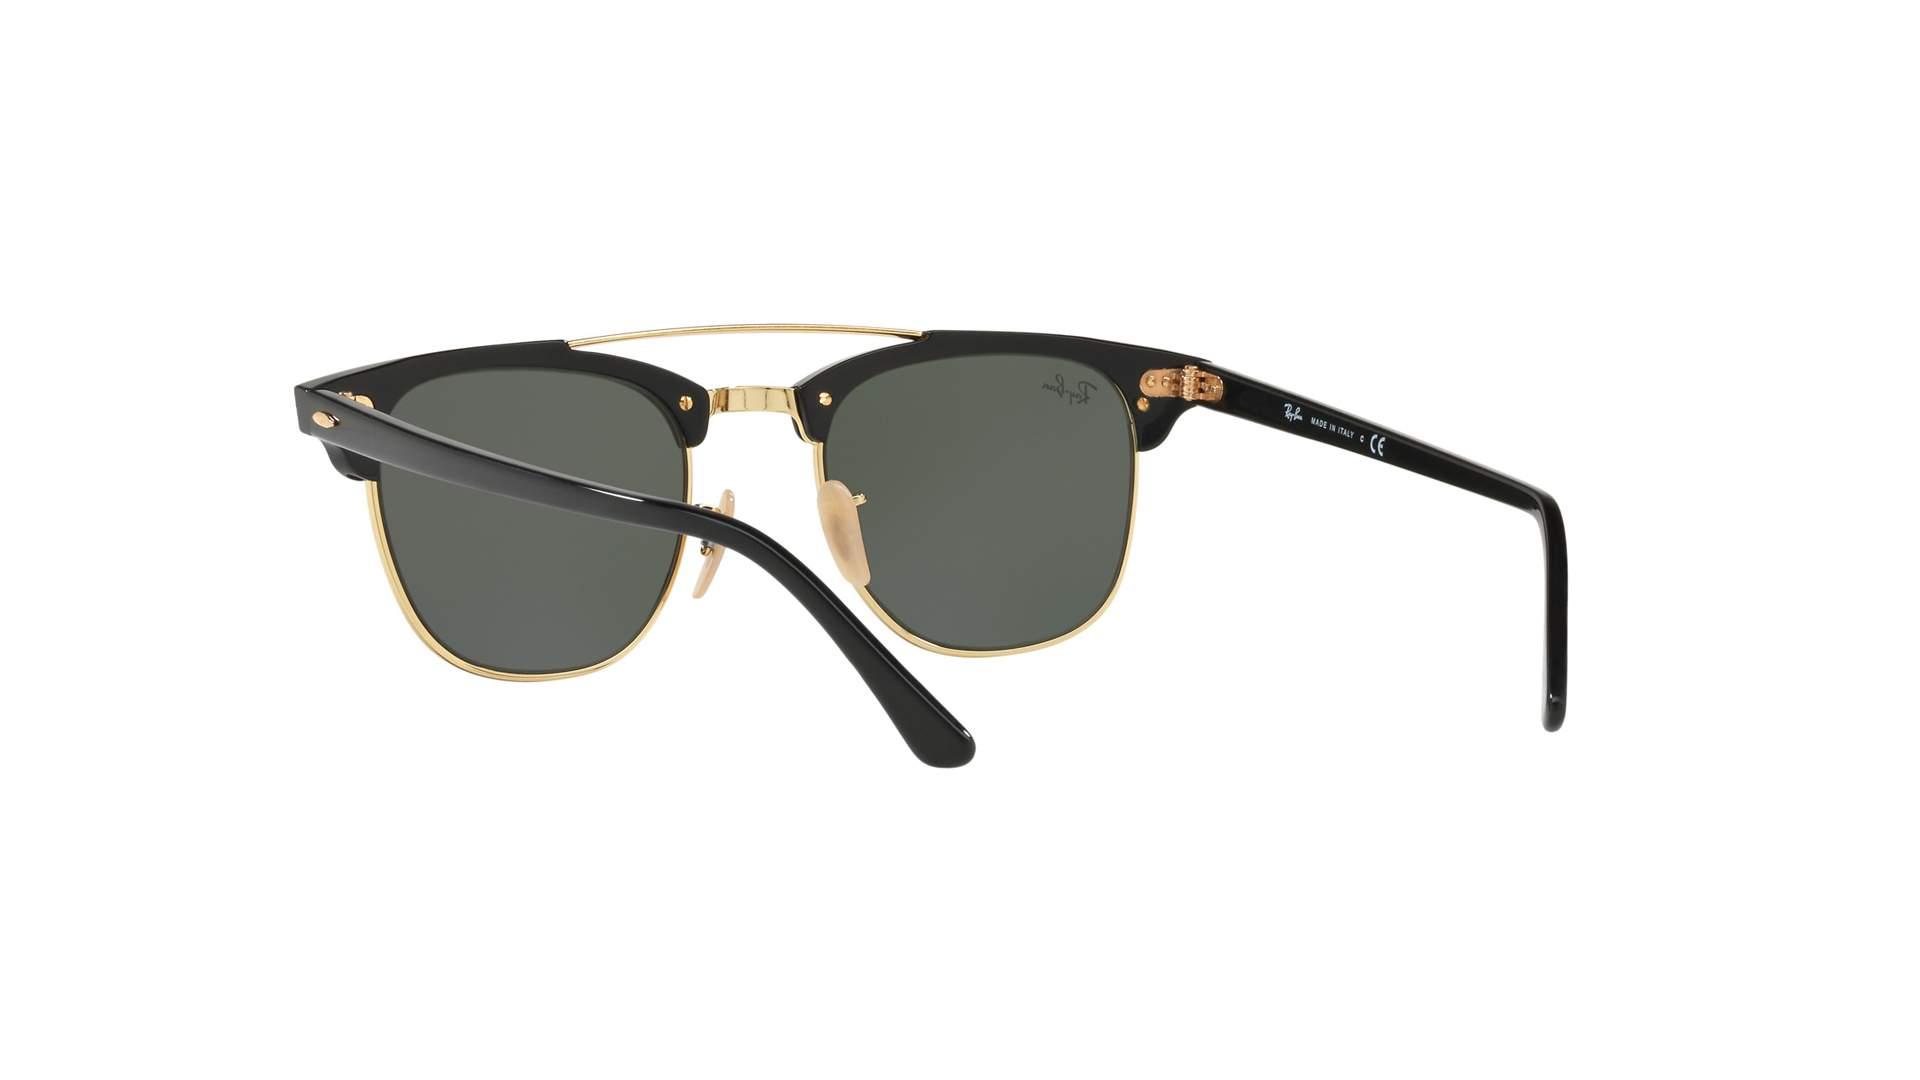 b6ed1e21f4d Sunglasses Ray-Ban Clubmaster Double Bridge Black G-15 RB3816 901 51-21  Medium